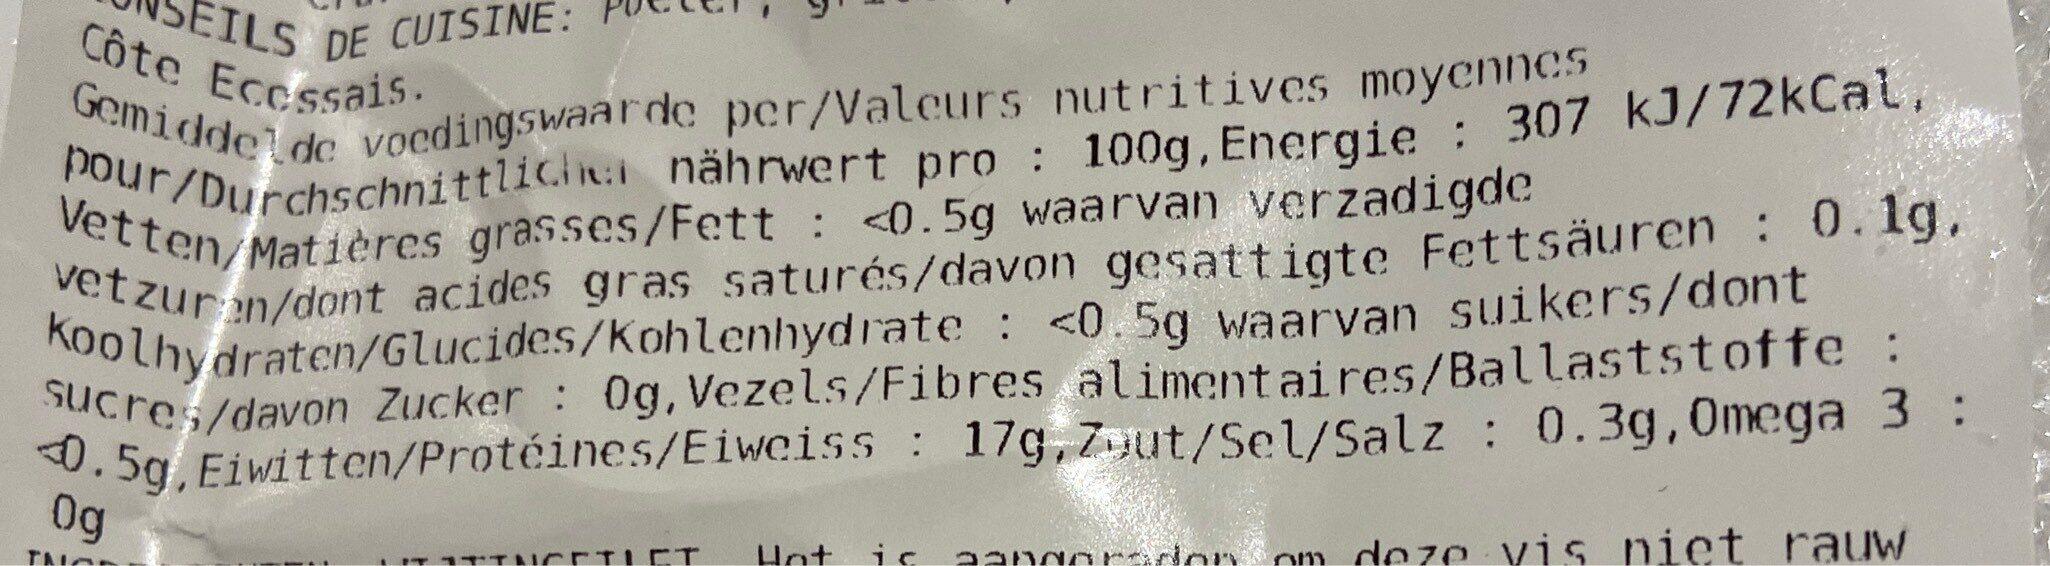 Filet de merlan - Informations nutritionnelles - fr